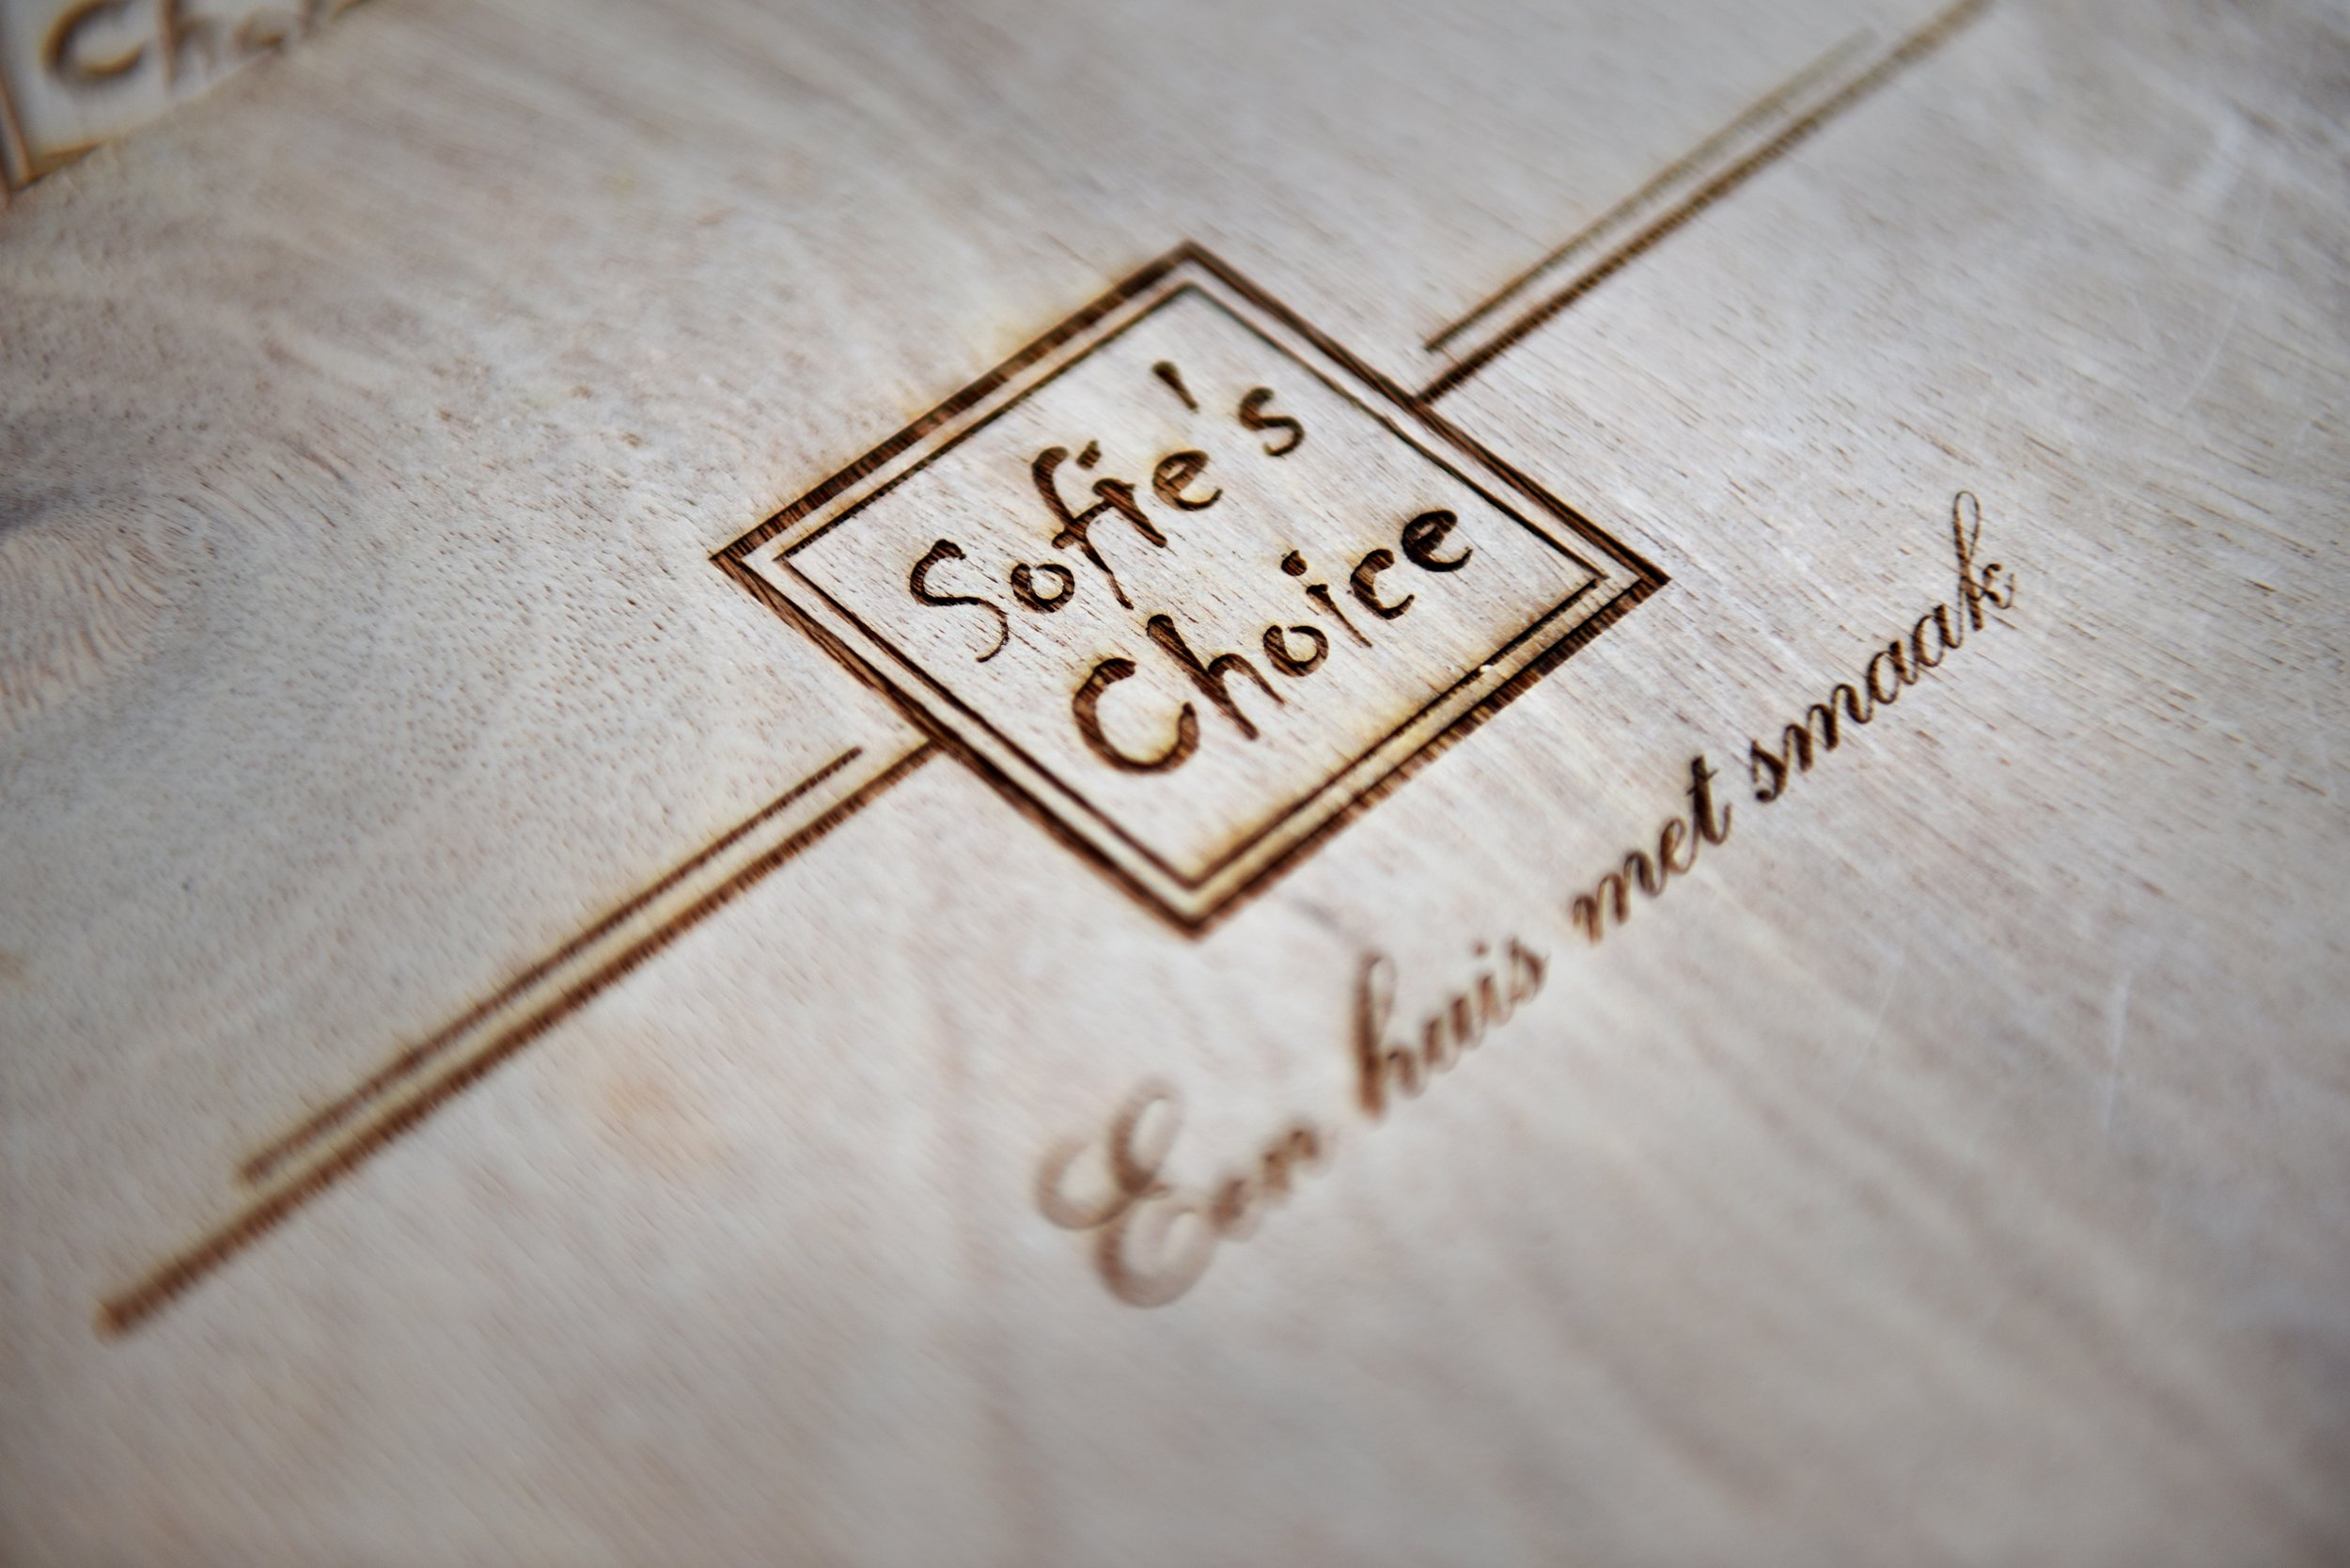 10 sofie s choice roeselare brasserie restaurant bart albrecht fotograaf food tablefever.jpg